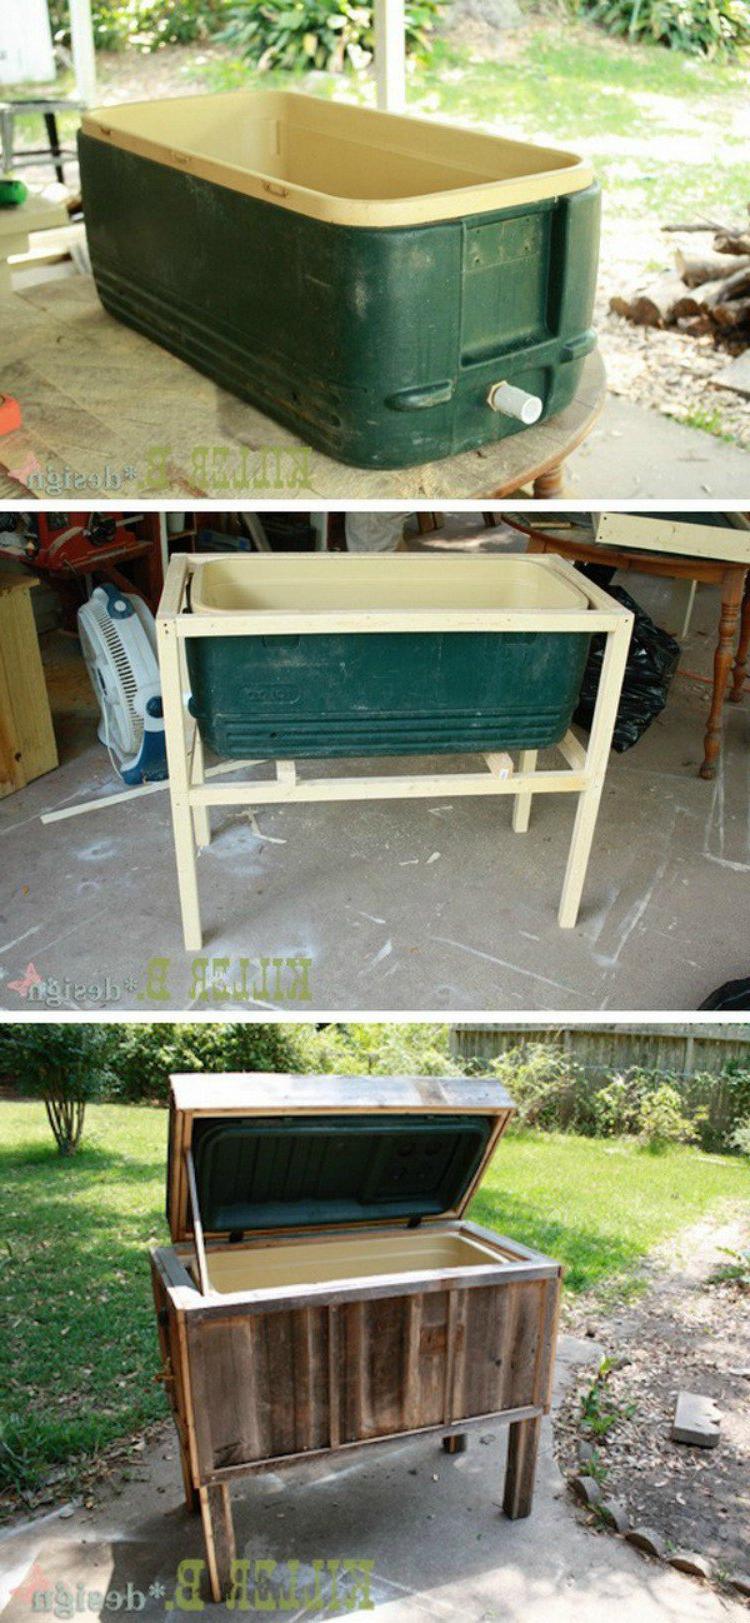 Reciclar Muebles Viejos Mndw 12 Ideas Para Reciclar Muebles Viejos Y Darles Una Segunda